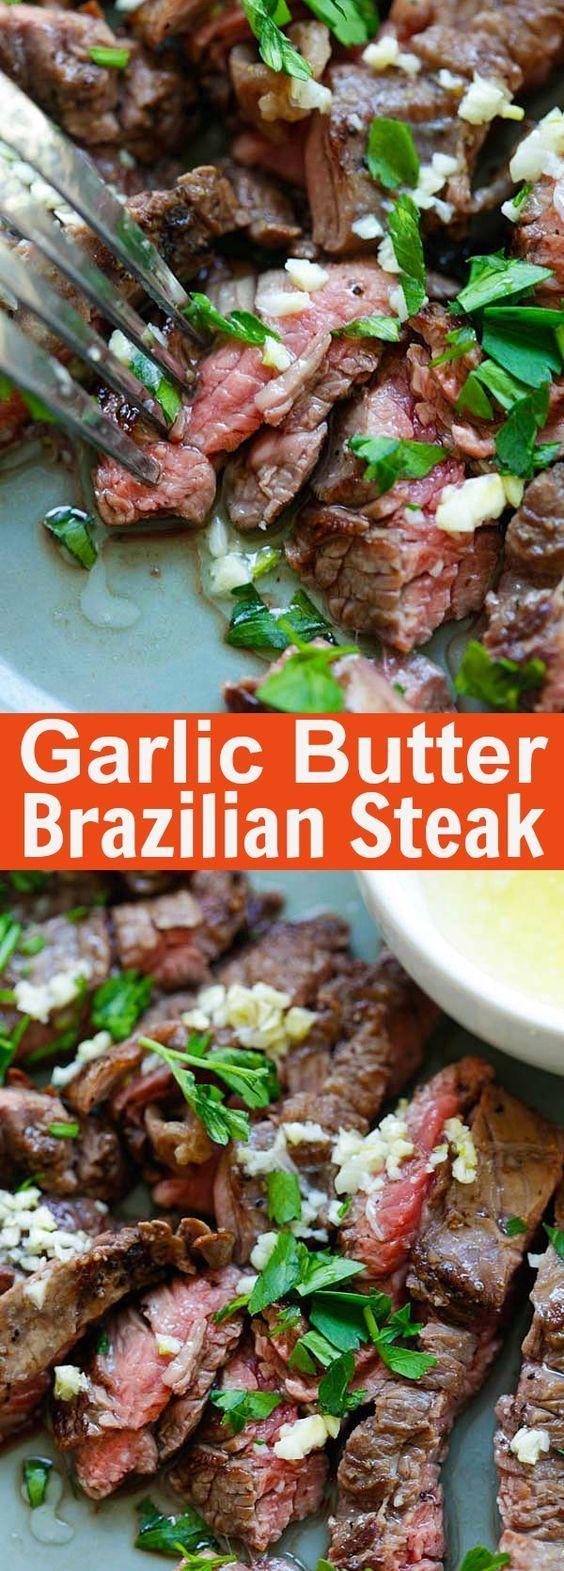 Garlic Butter Brazilian Steak | Cake And Food Recipe